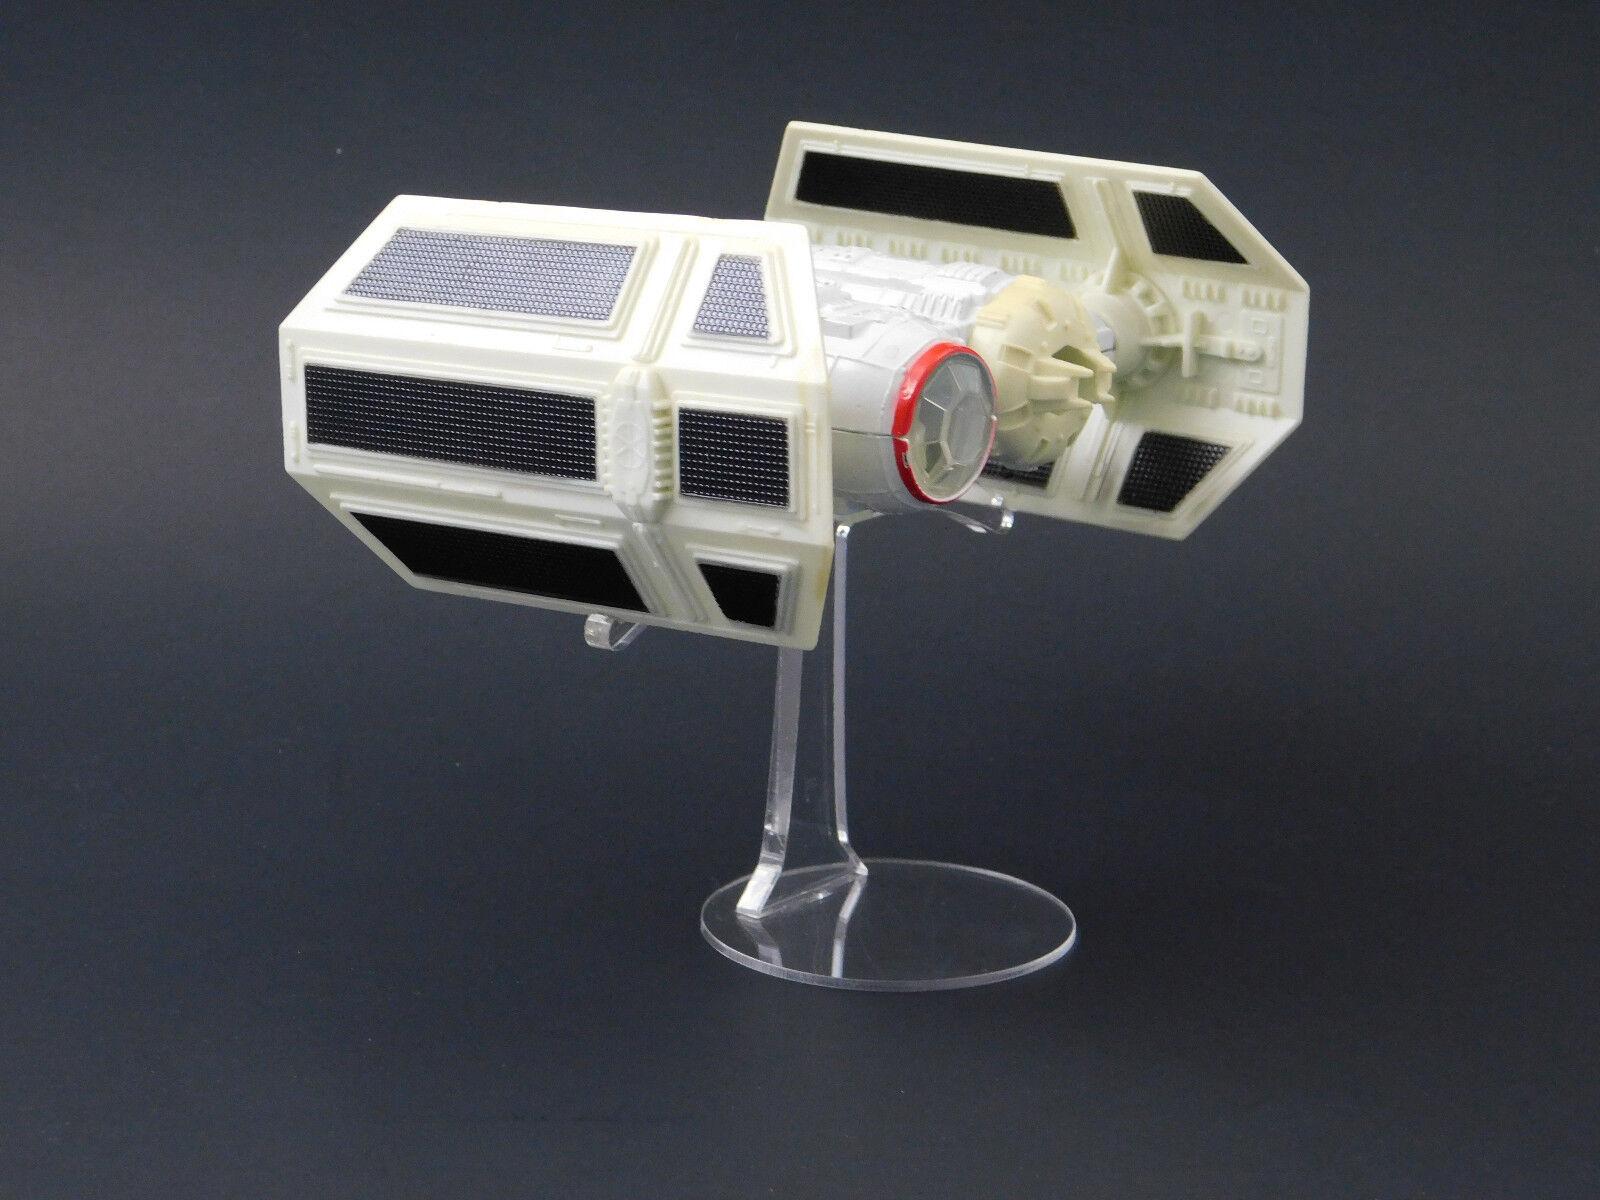 Set of 11 - Die Cast Display Stands - Vintage Star Wars (STAND ONLY) - inc Tie B